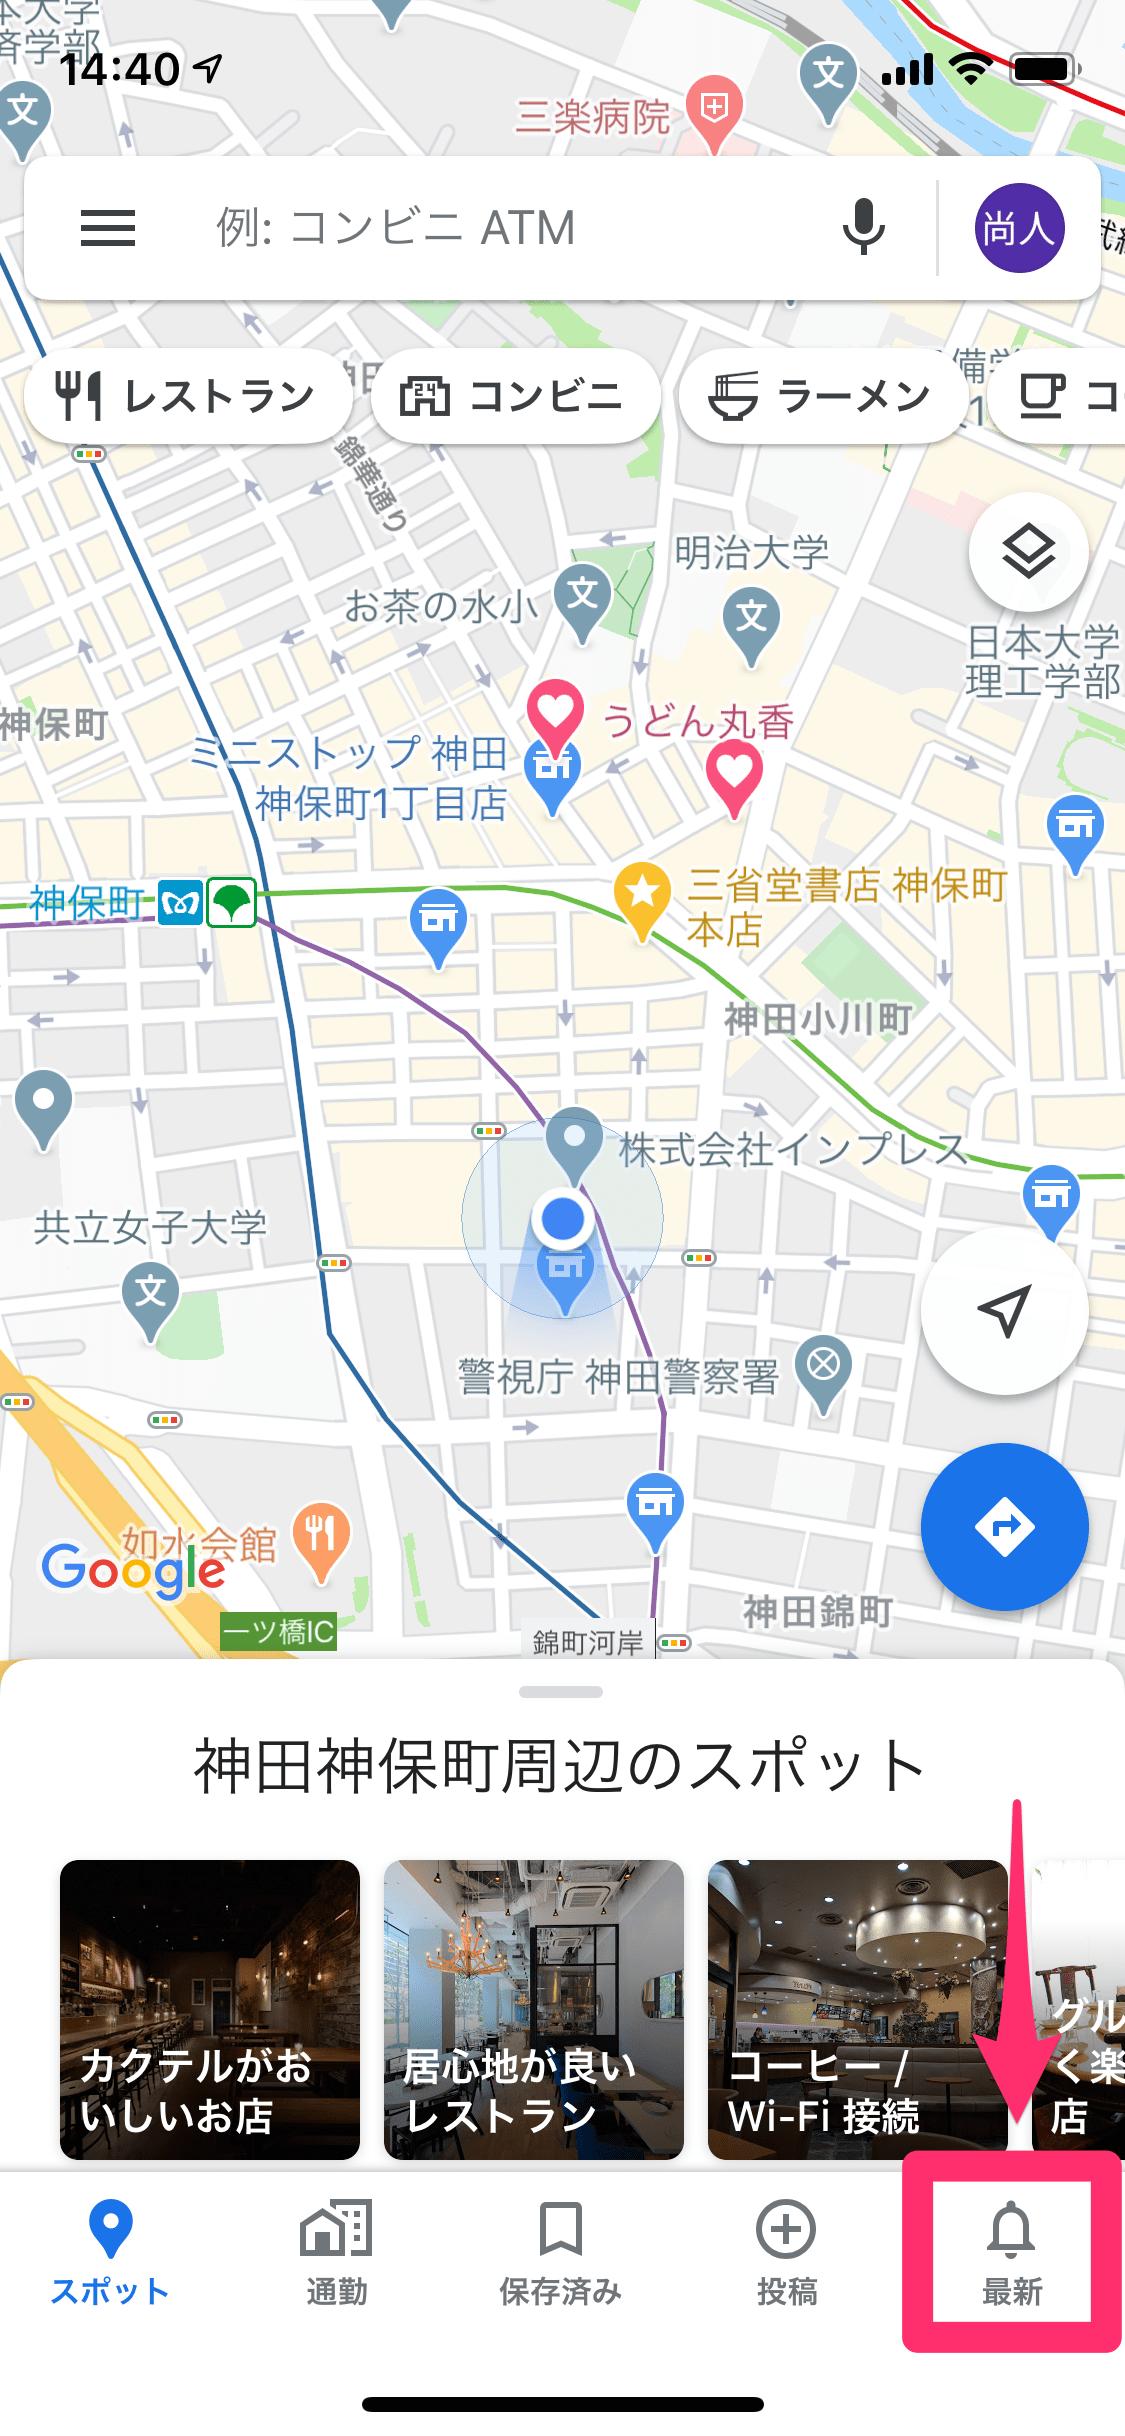 Googleマップでエリアをフォロー。飲食店の最新のクチコミなどを教えてもらえる